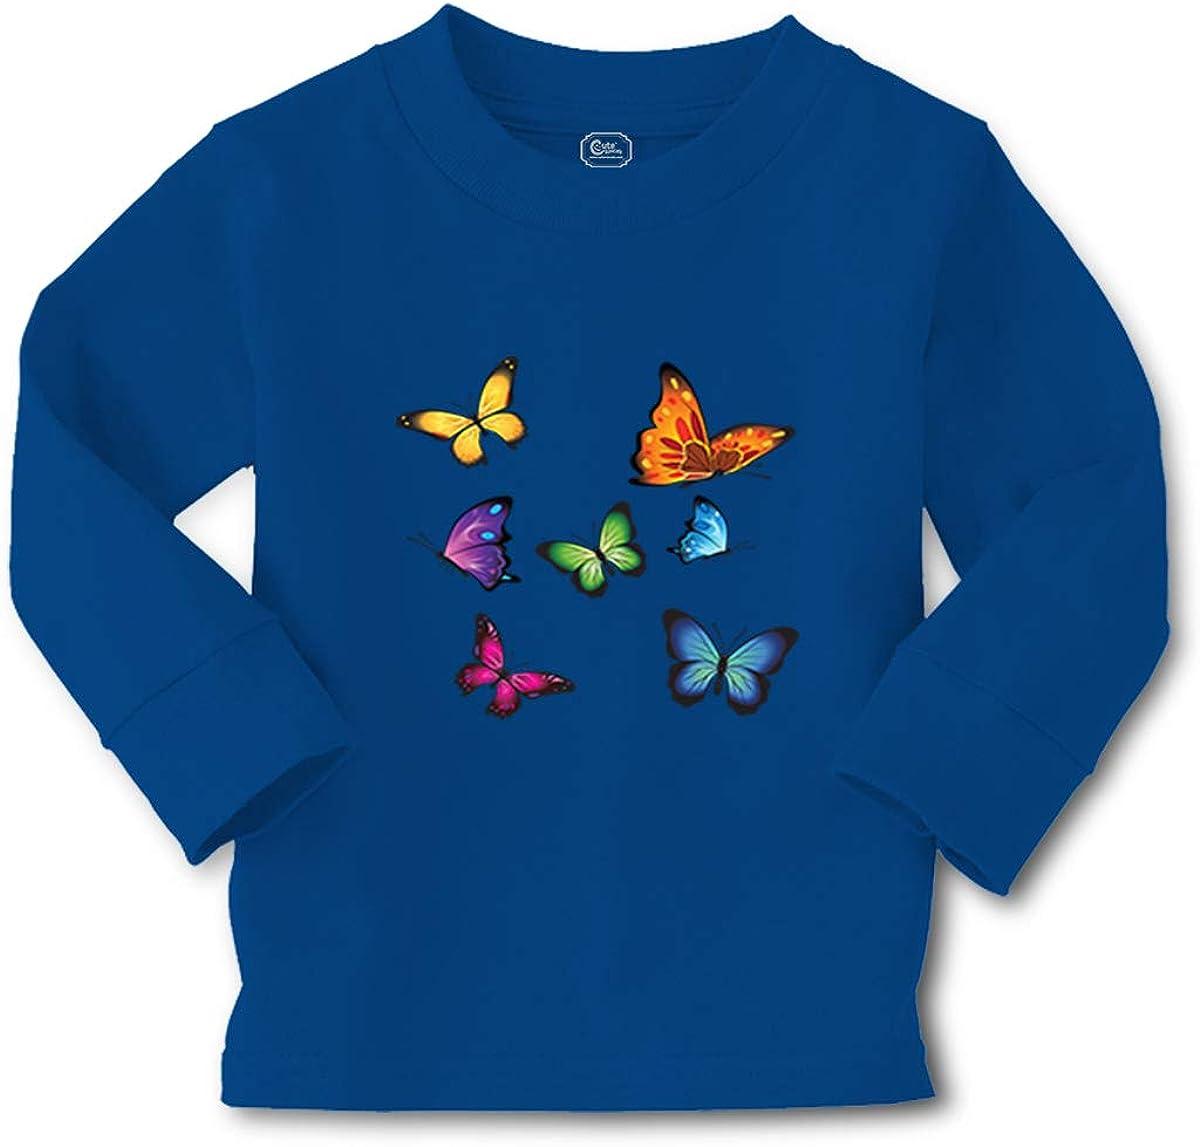 Cute Rascals Kids Long Sleeve T Shirt Butterflies Cotton Boy & Girl Clothes Funny Graphic Tee